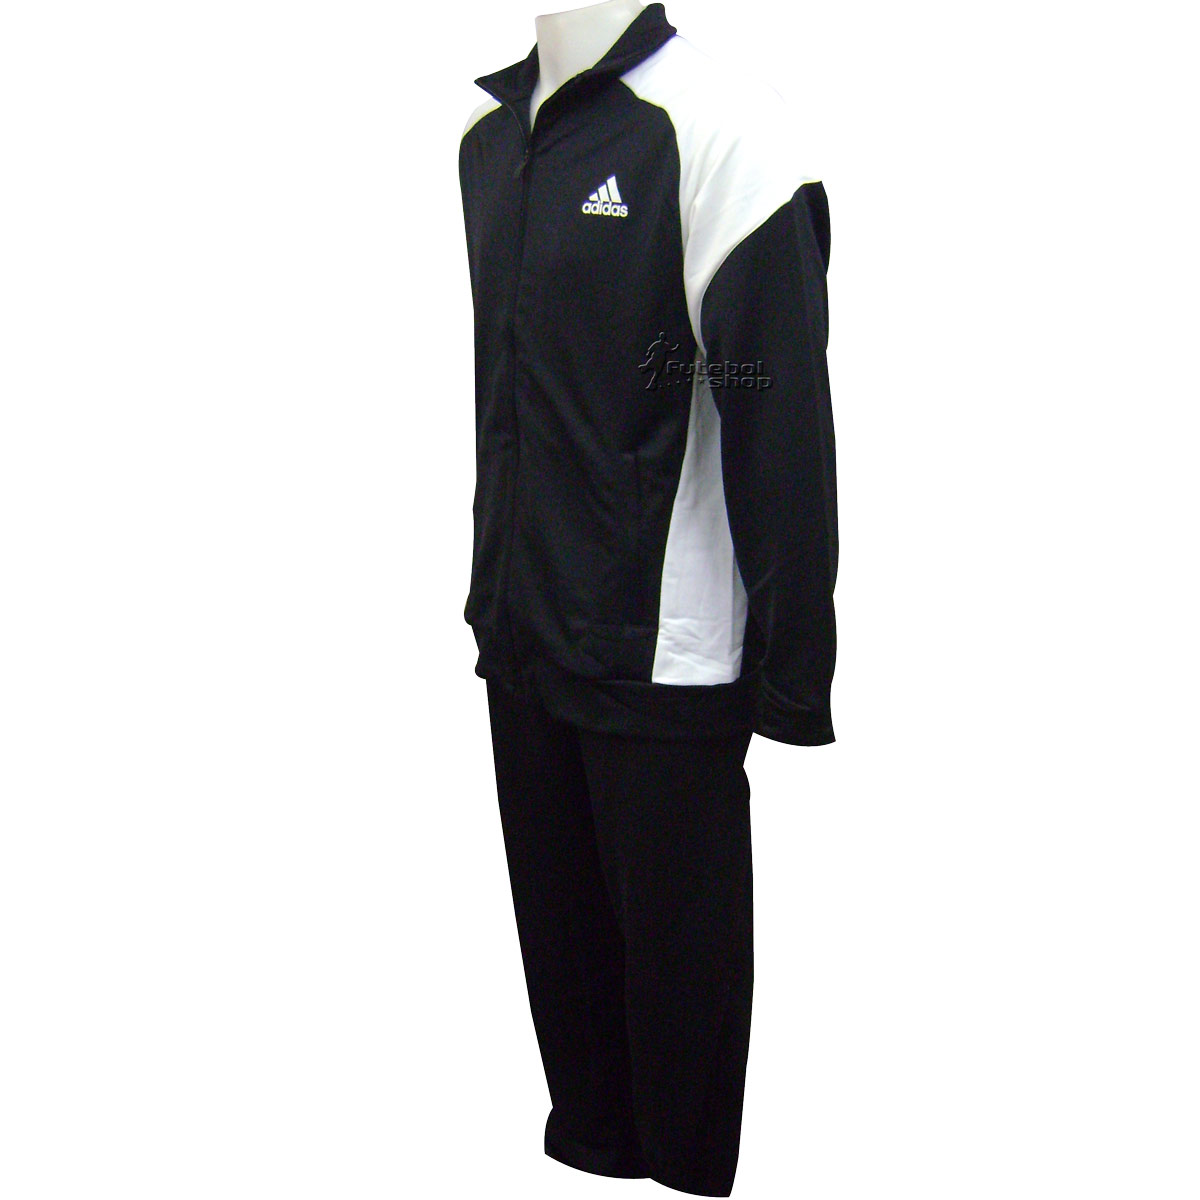 Agasalho Adidas Barricade Team - Z11896